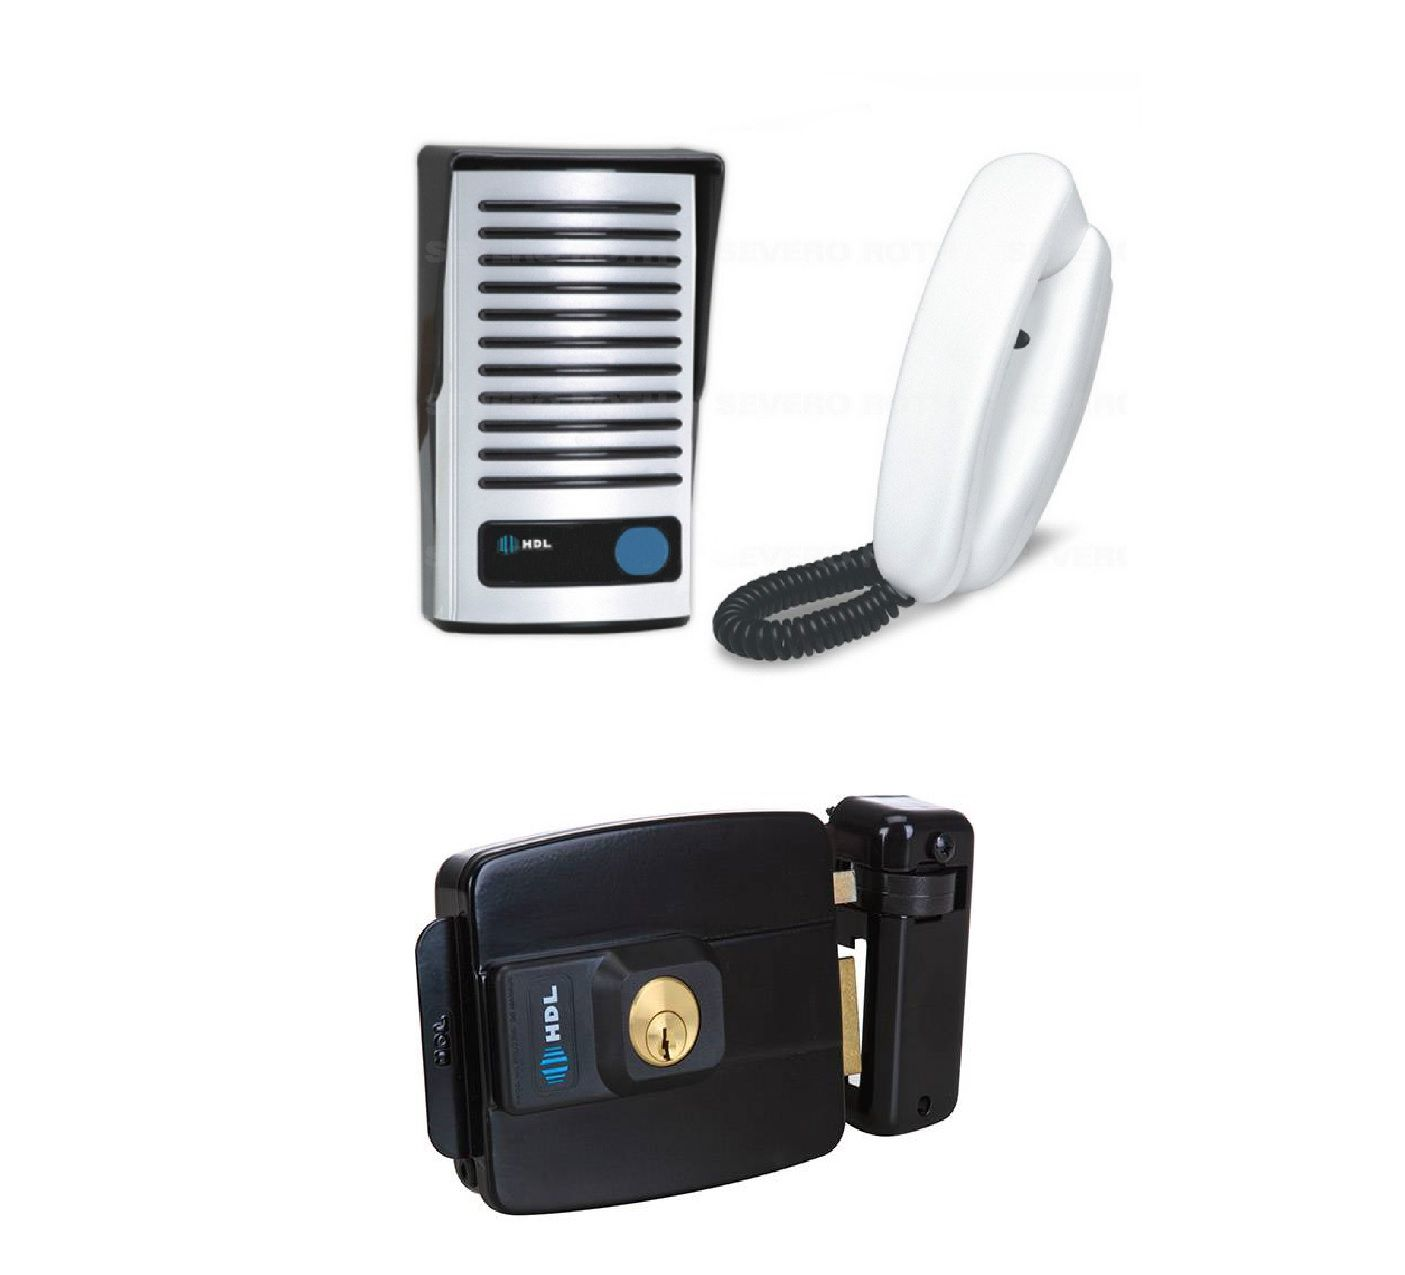 Kit Interfone F8-ntl e fechadura abre pra fora HDL